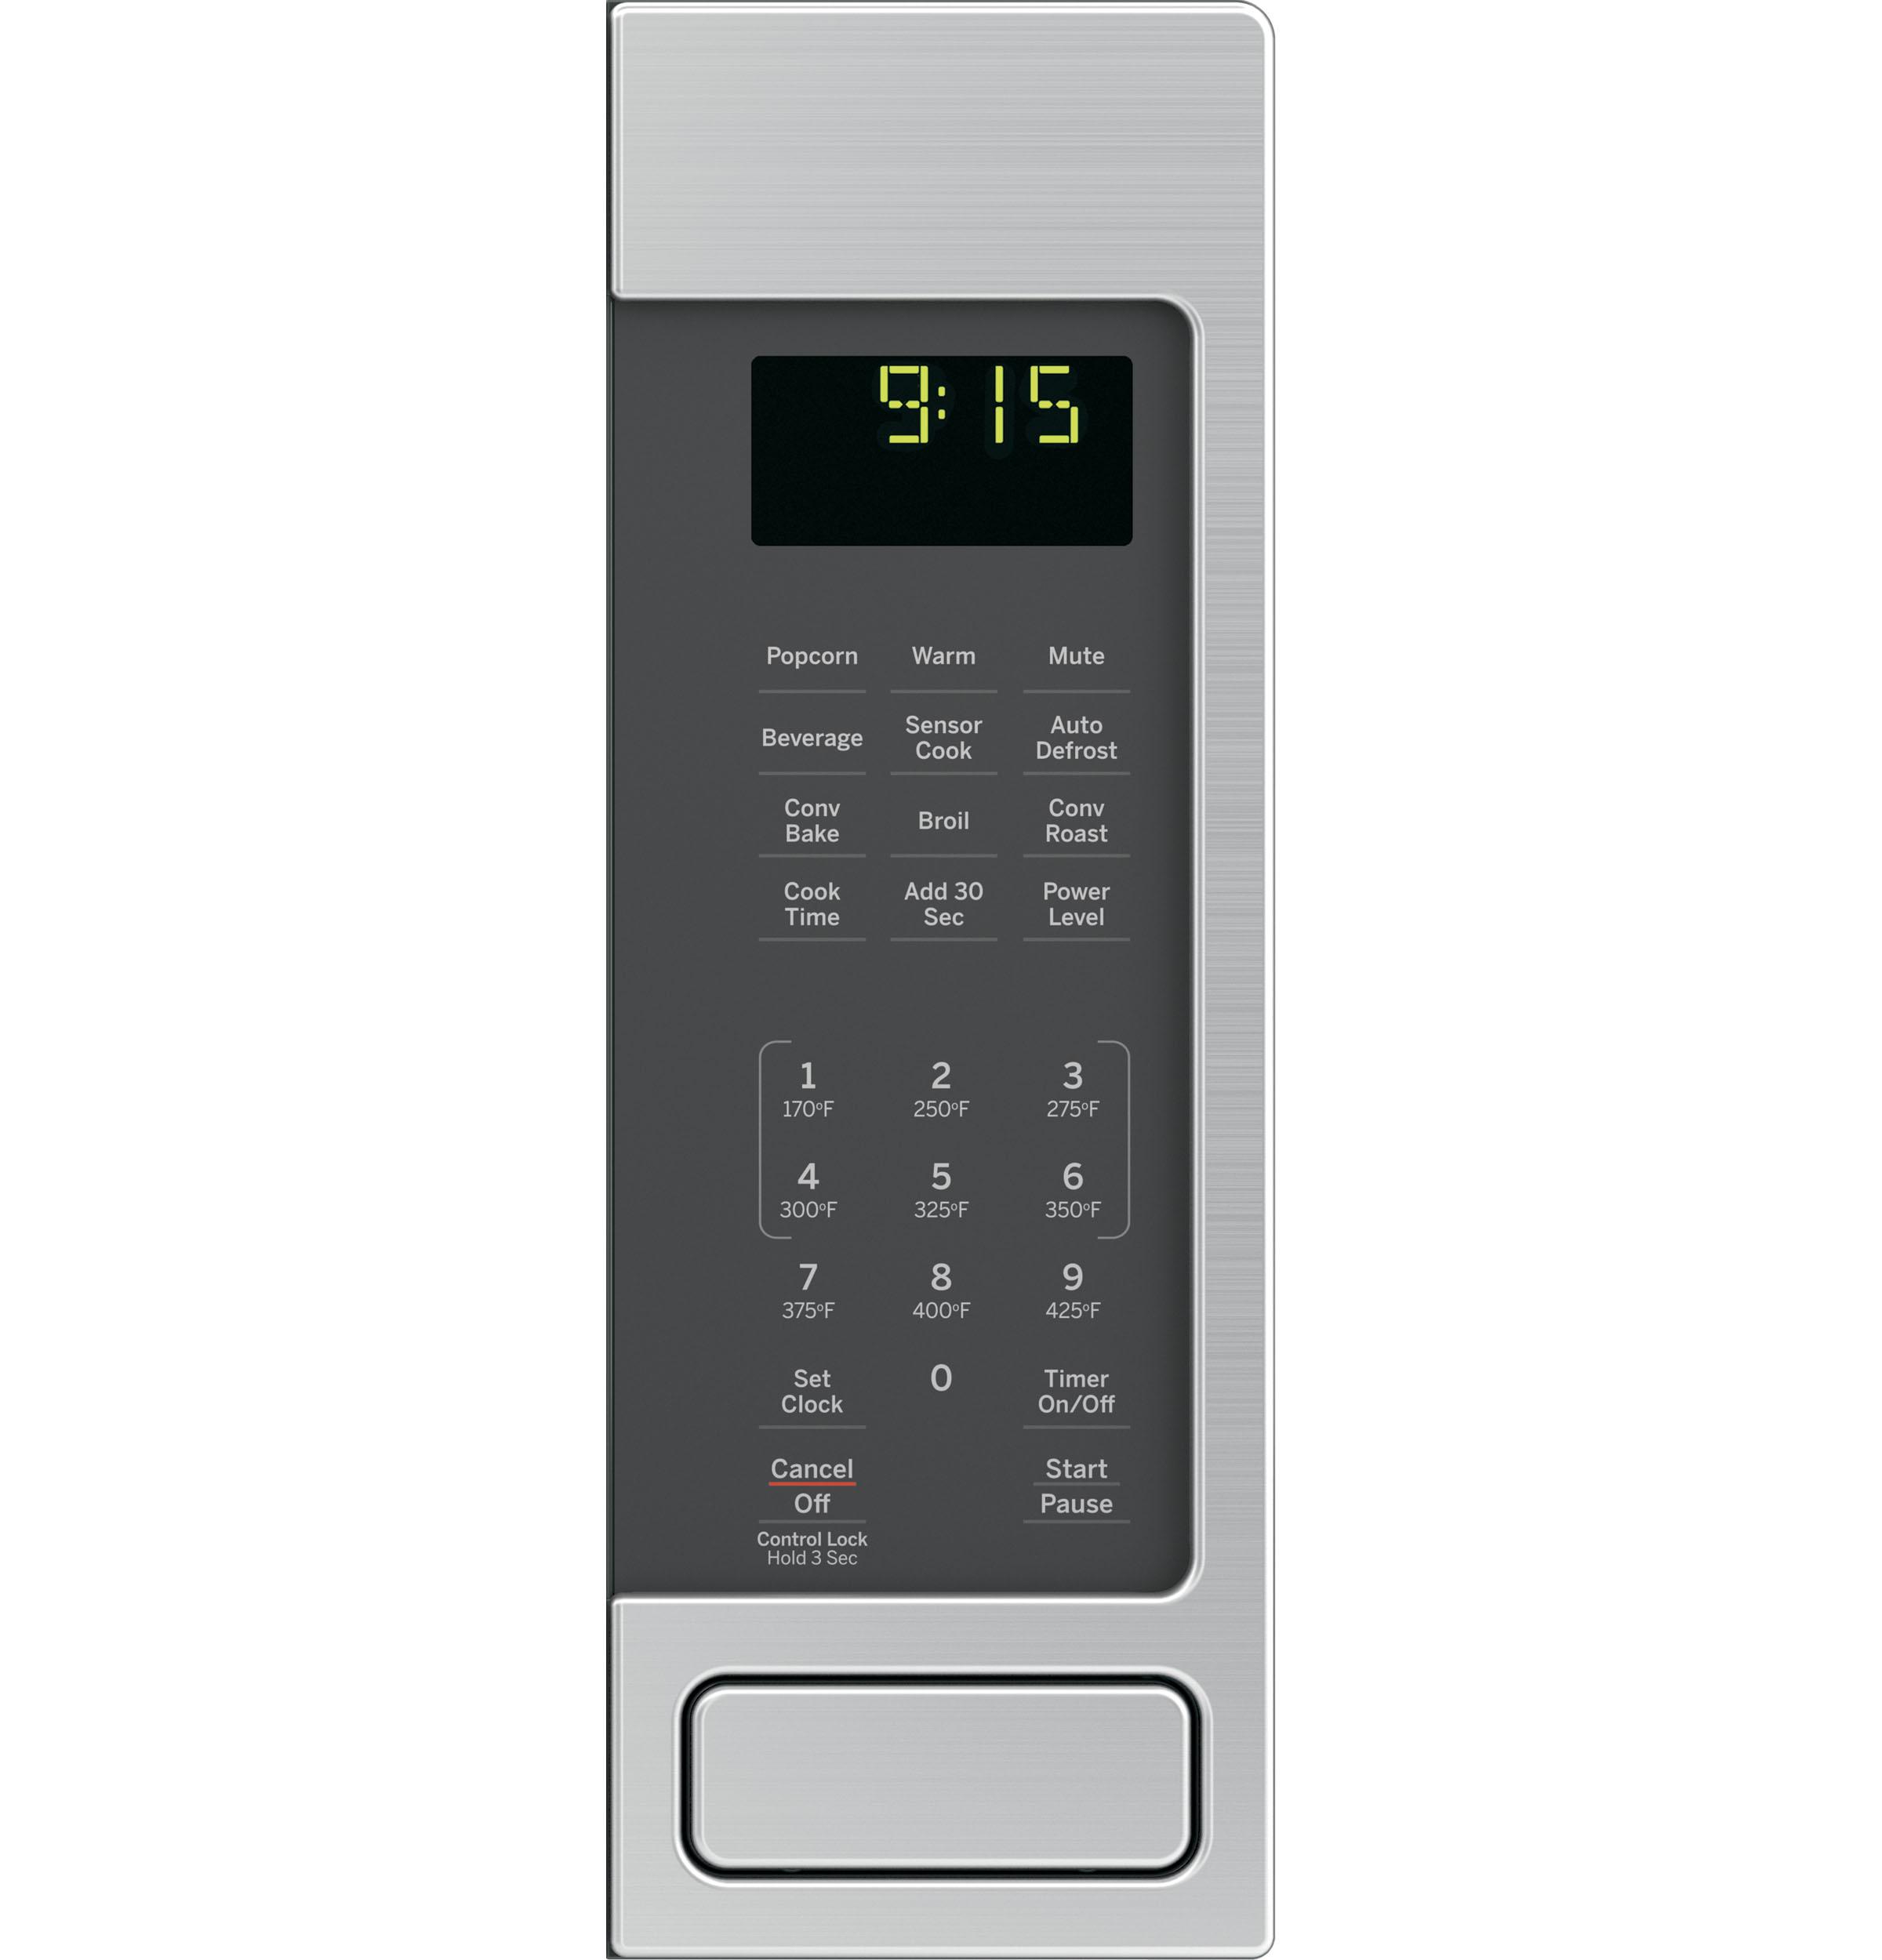 ge profile peb9159sjss ge profile 1 5 cu ft countertop convection microwave oven peb9159sjss j b zimmerman